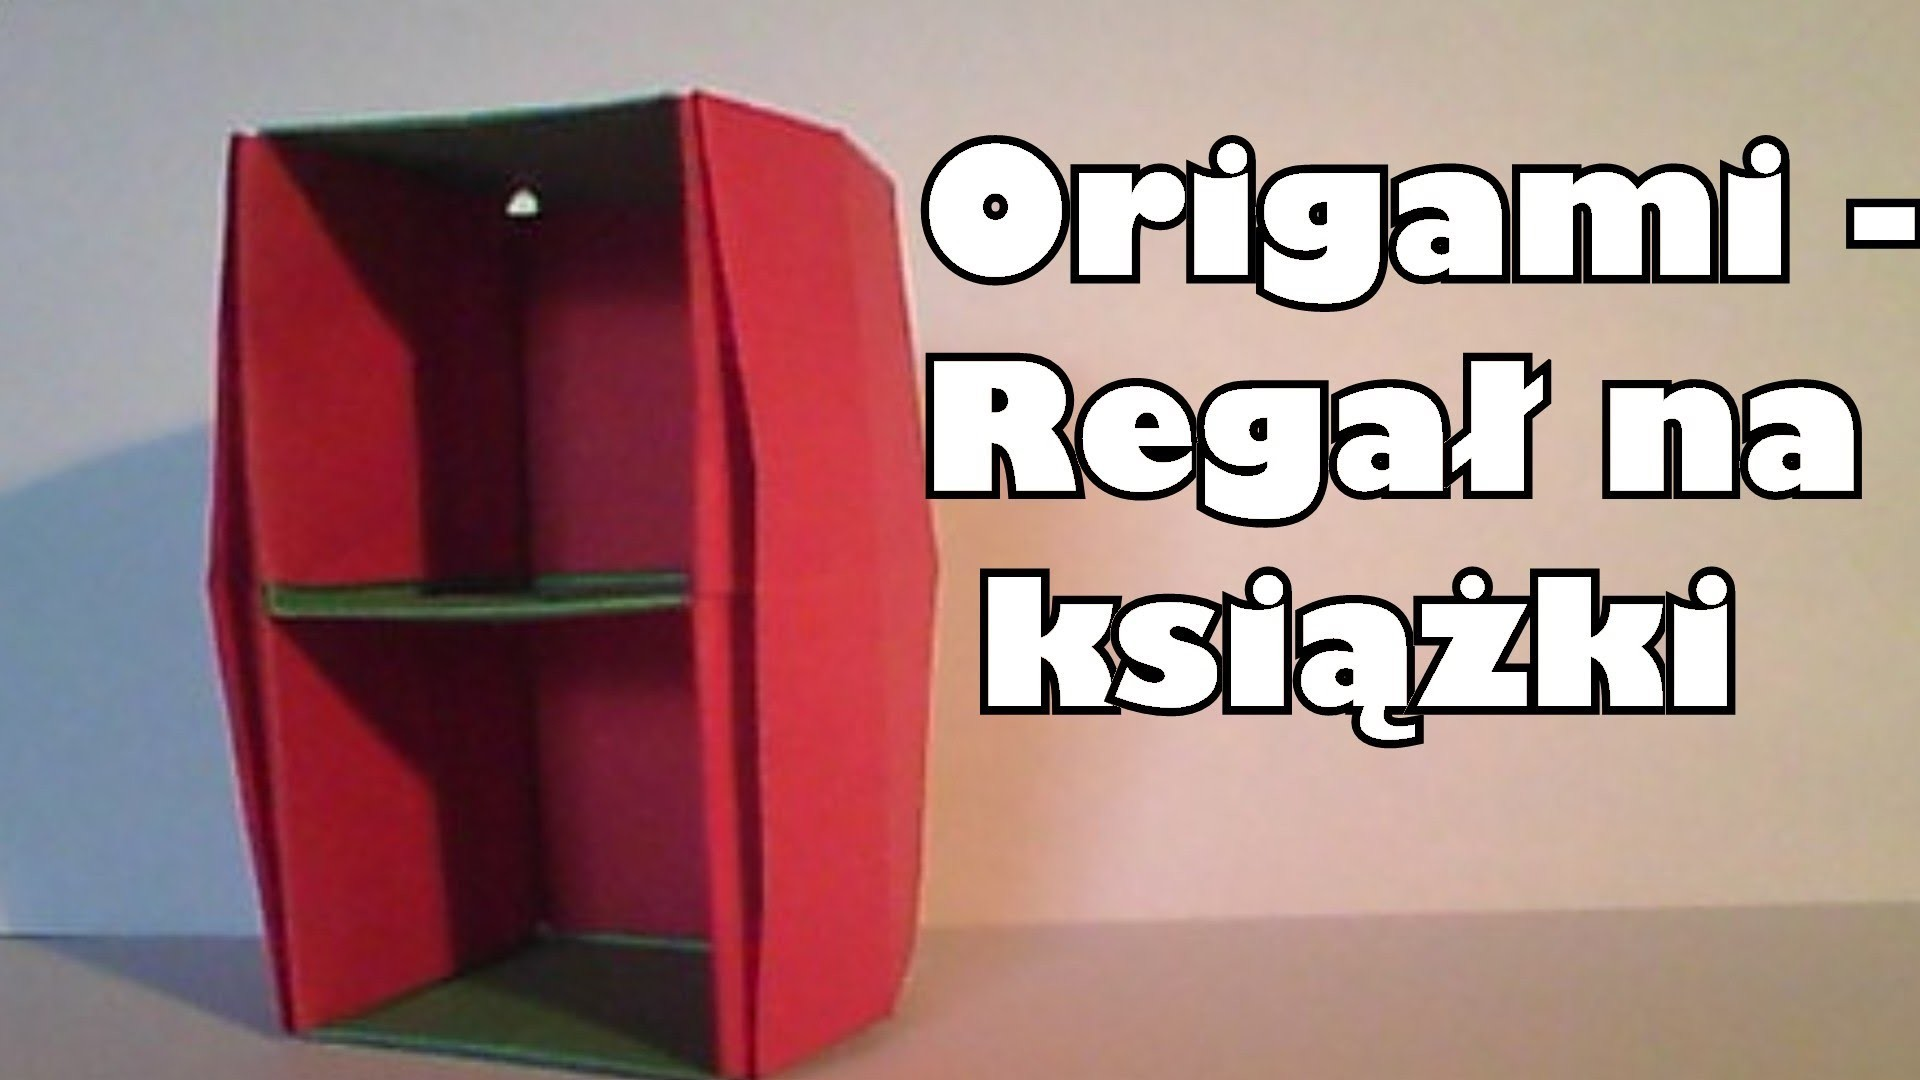 Origami - Regał na książki